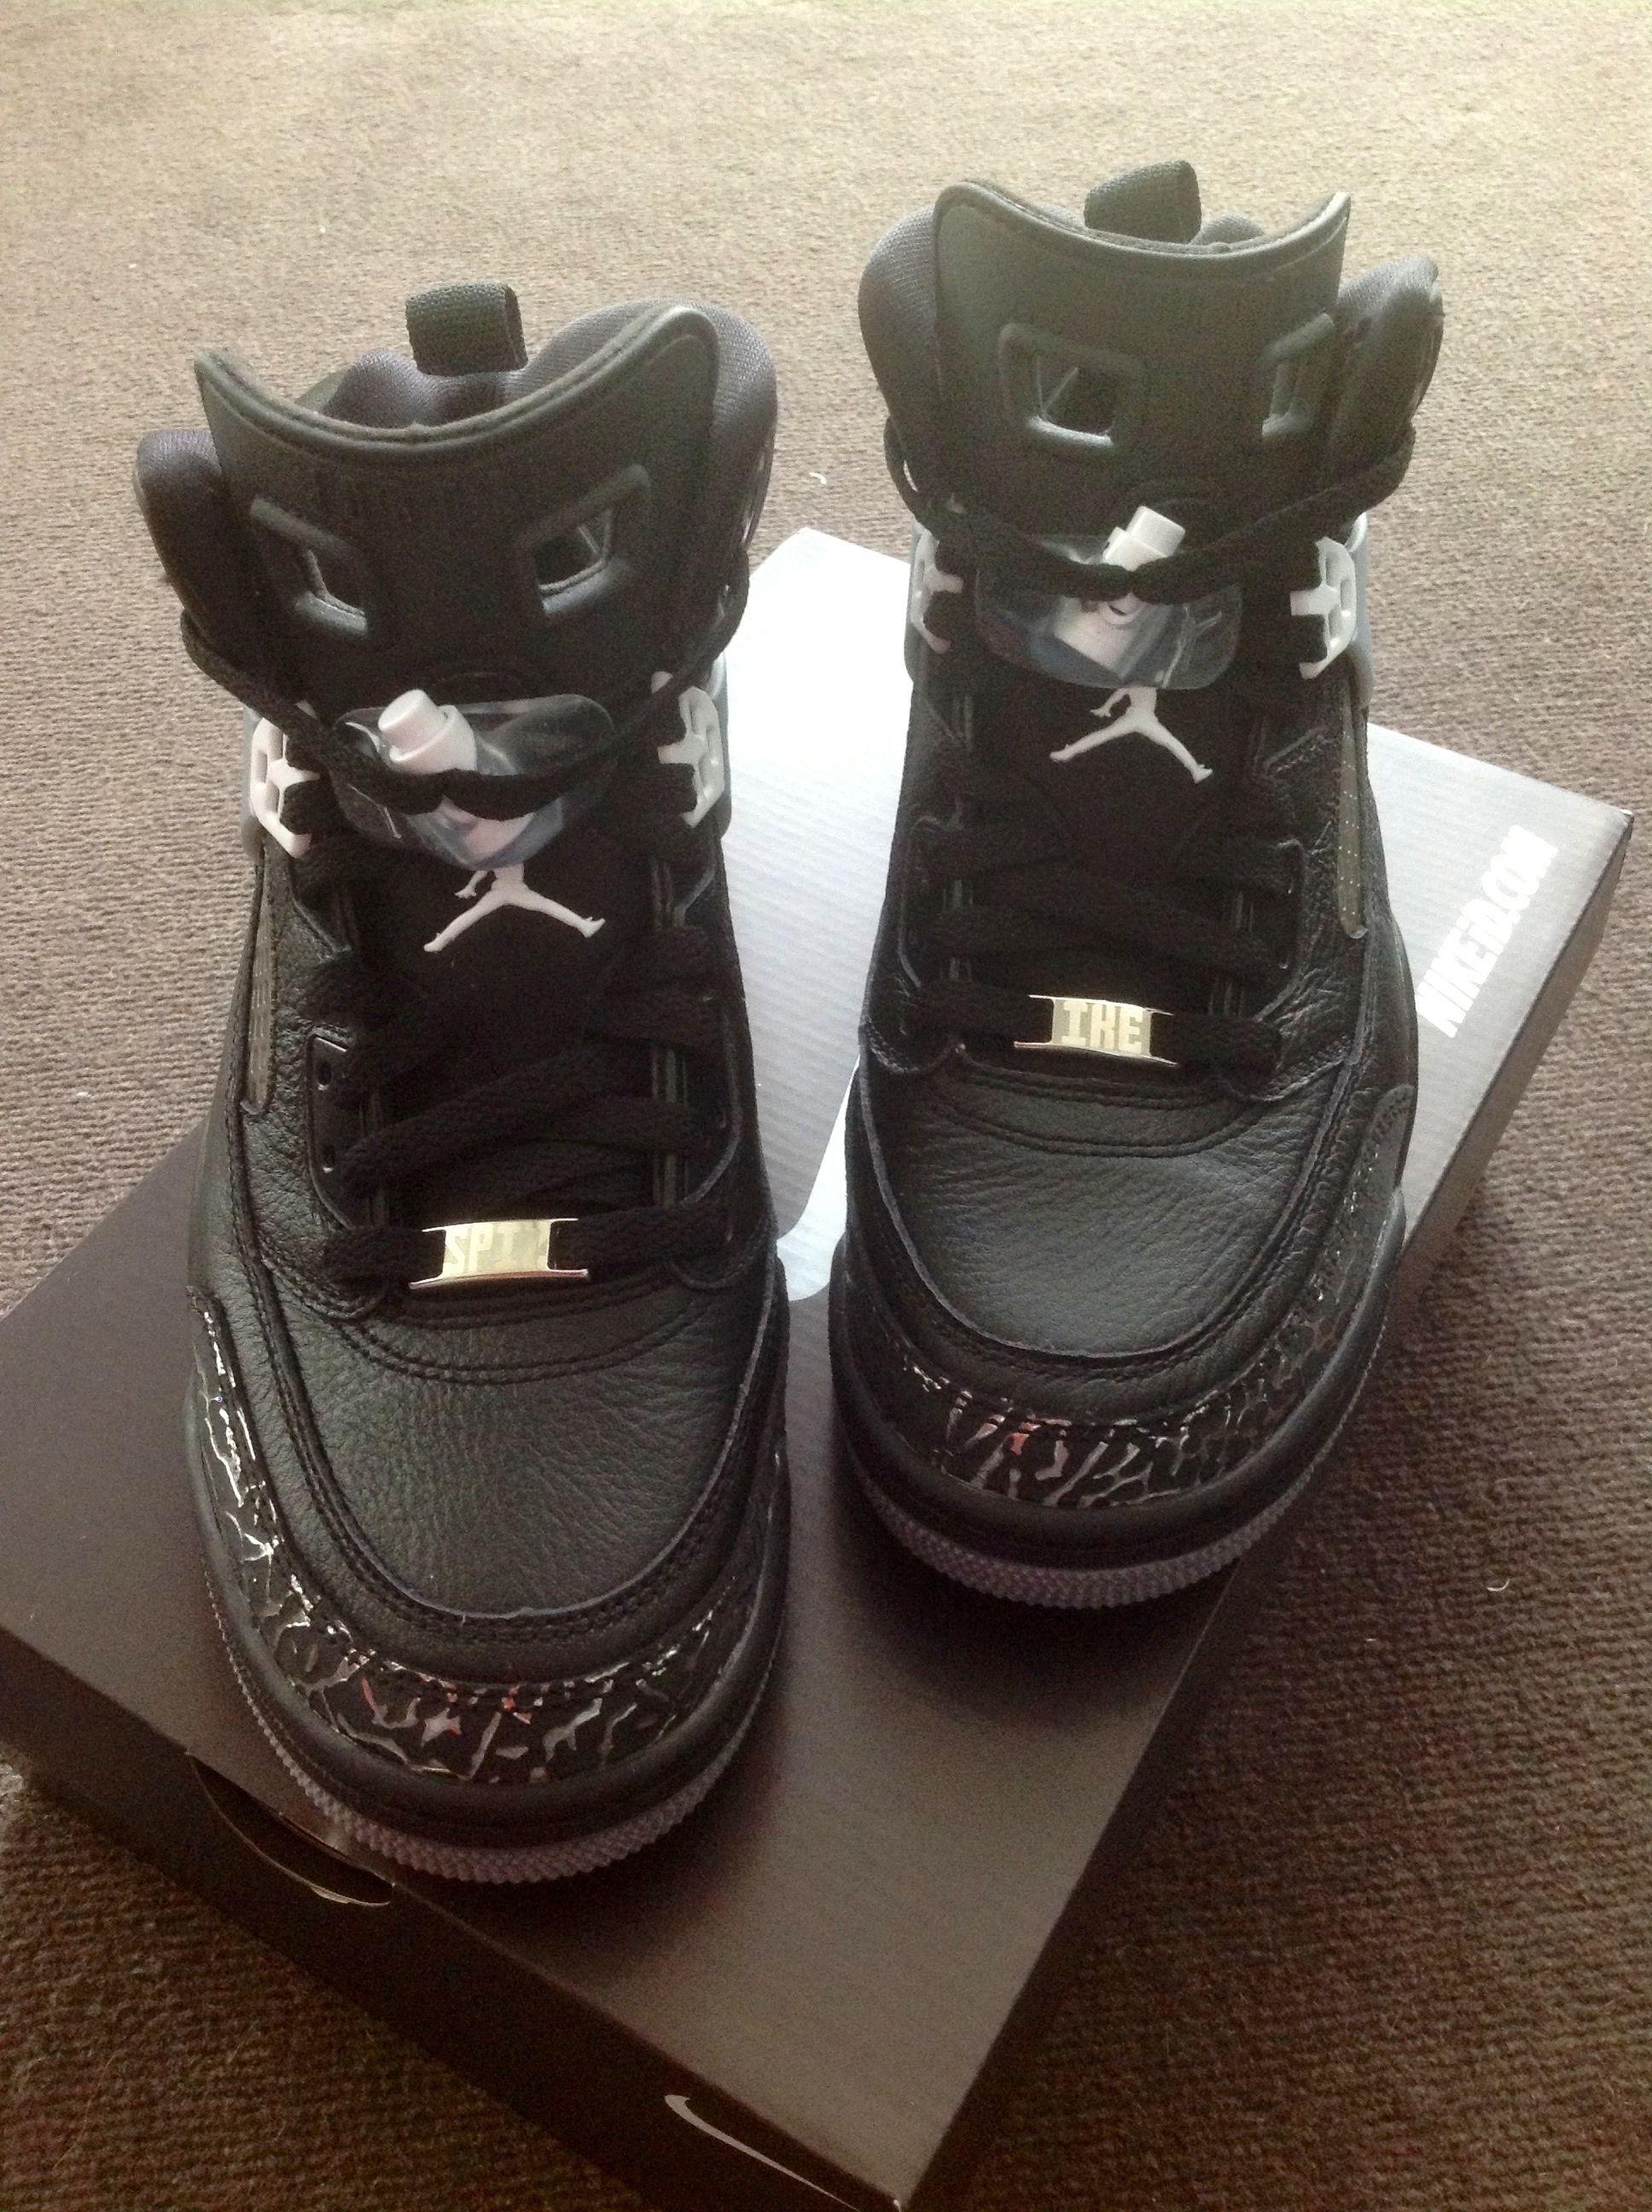 604fbe385d1 NikeID Jordan Spizike (Unboxing)  Nikeid  Jordans  Jumpman  Spizike  Black   Cement  Unboxing